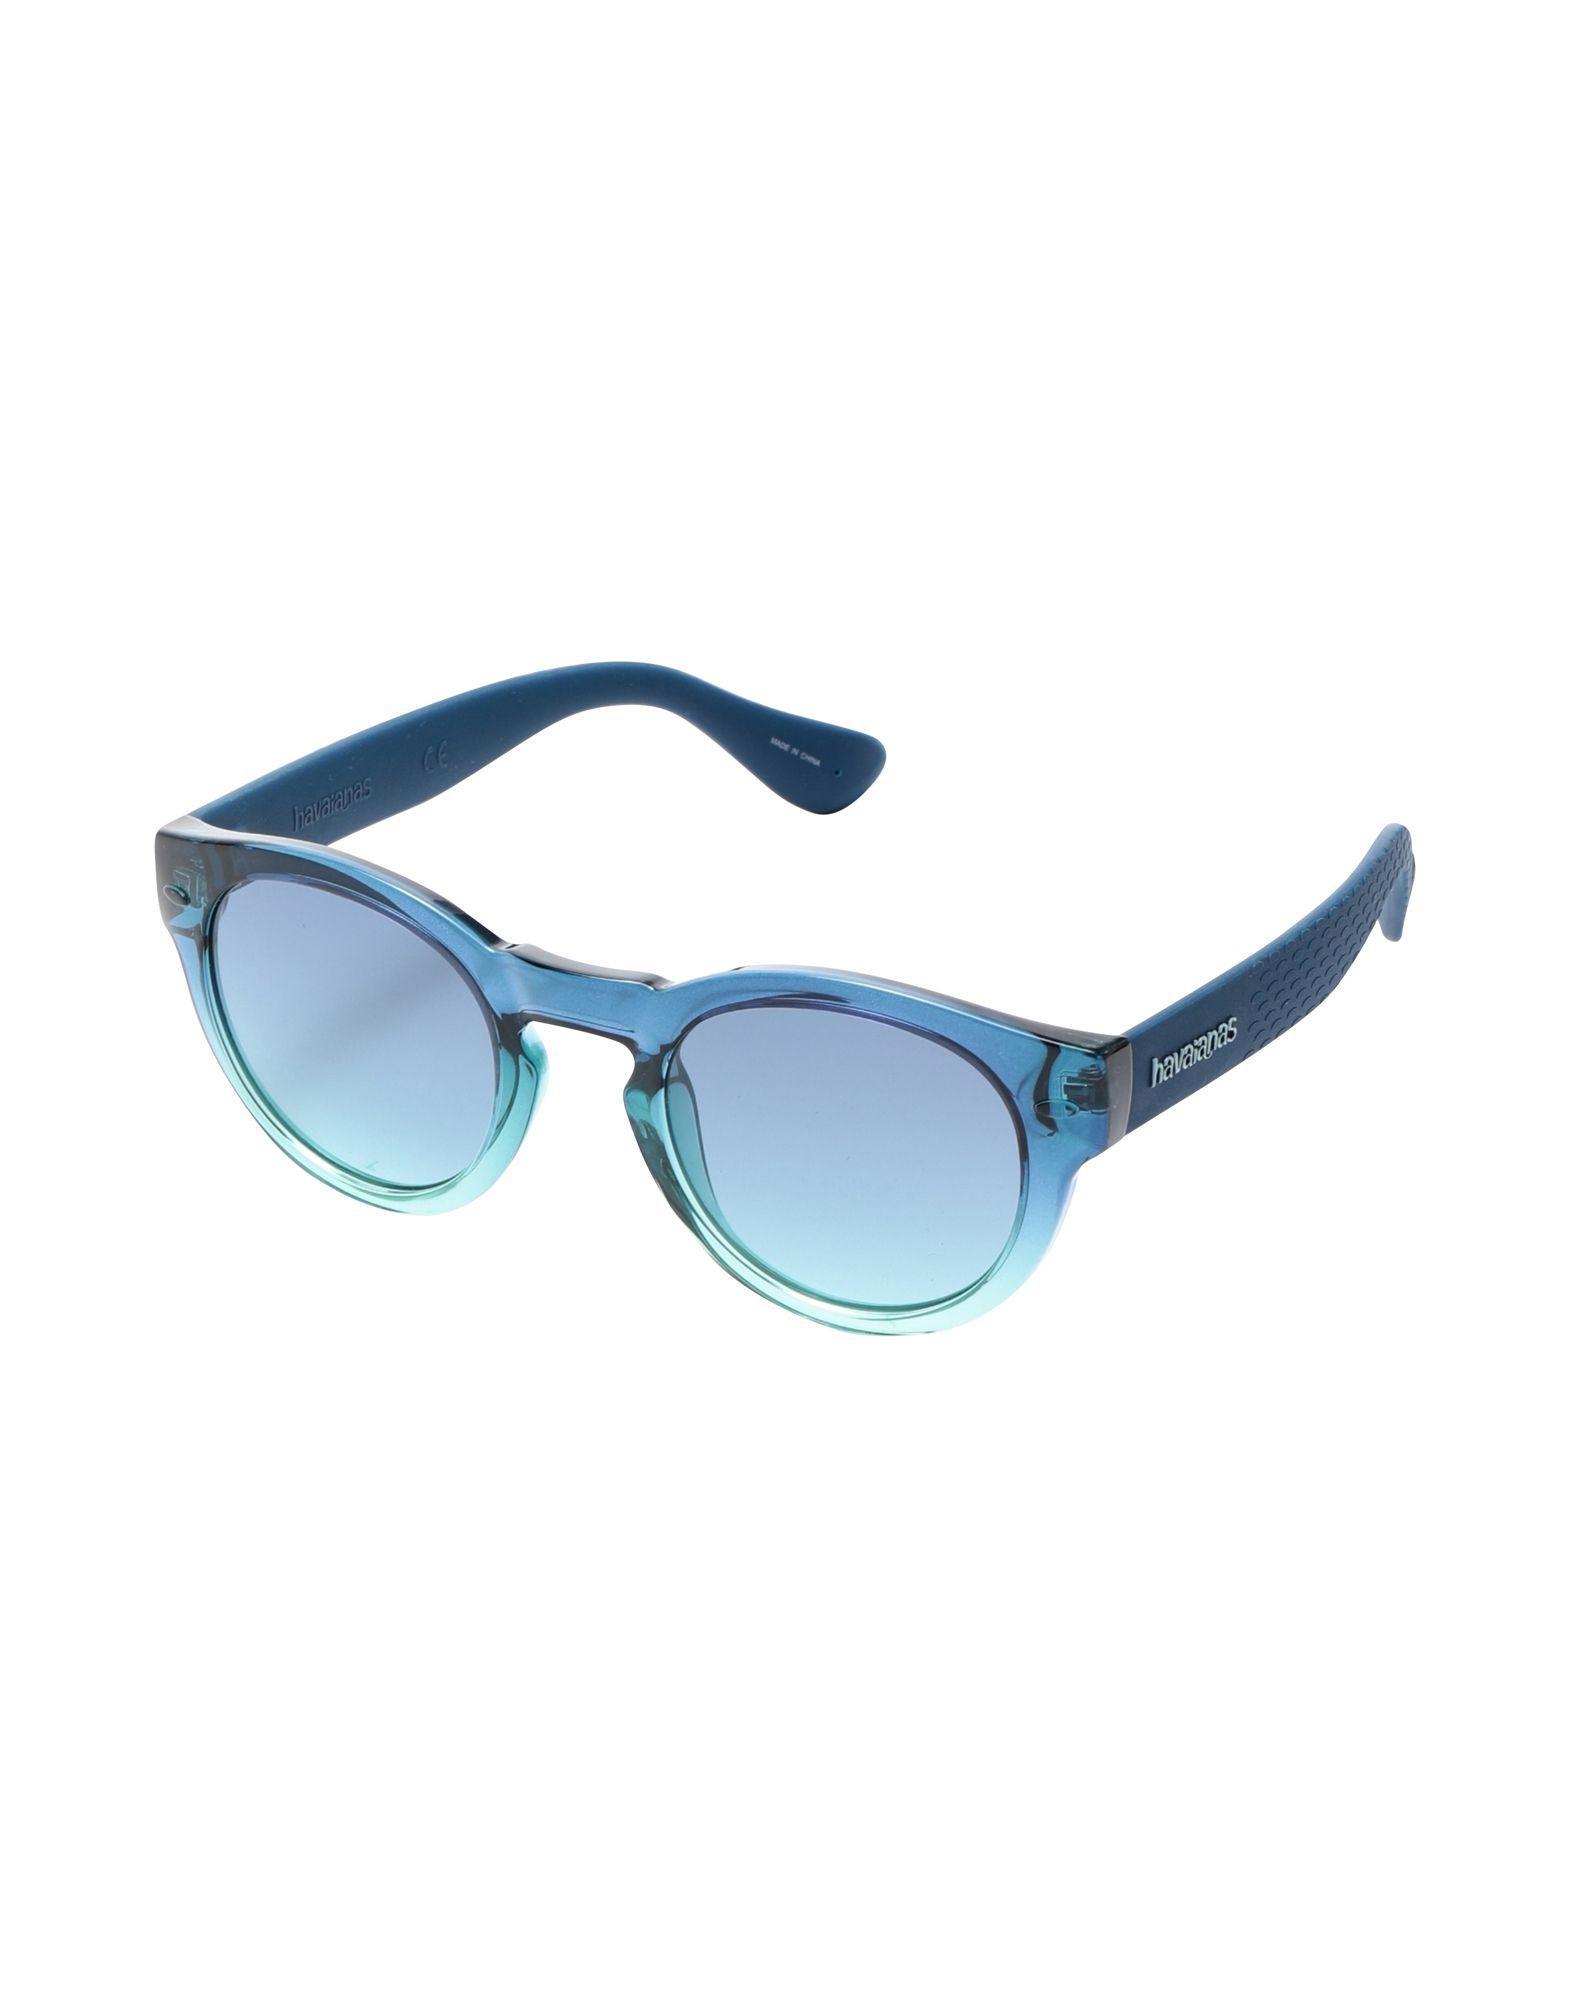 0e40eb2c0 Havaianas - Blue Sunglasses - Lyst. View fullscreen